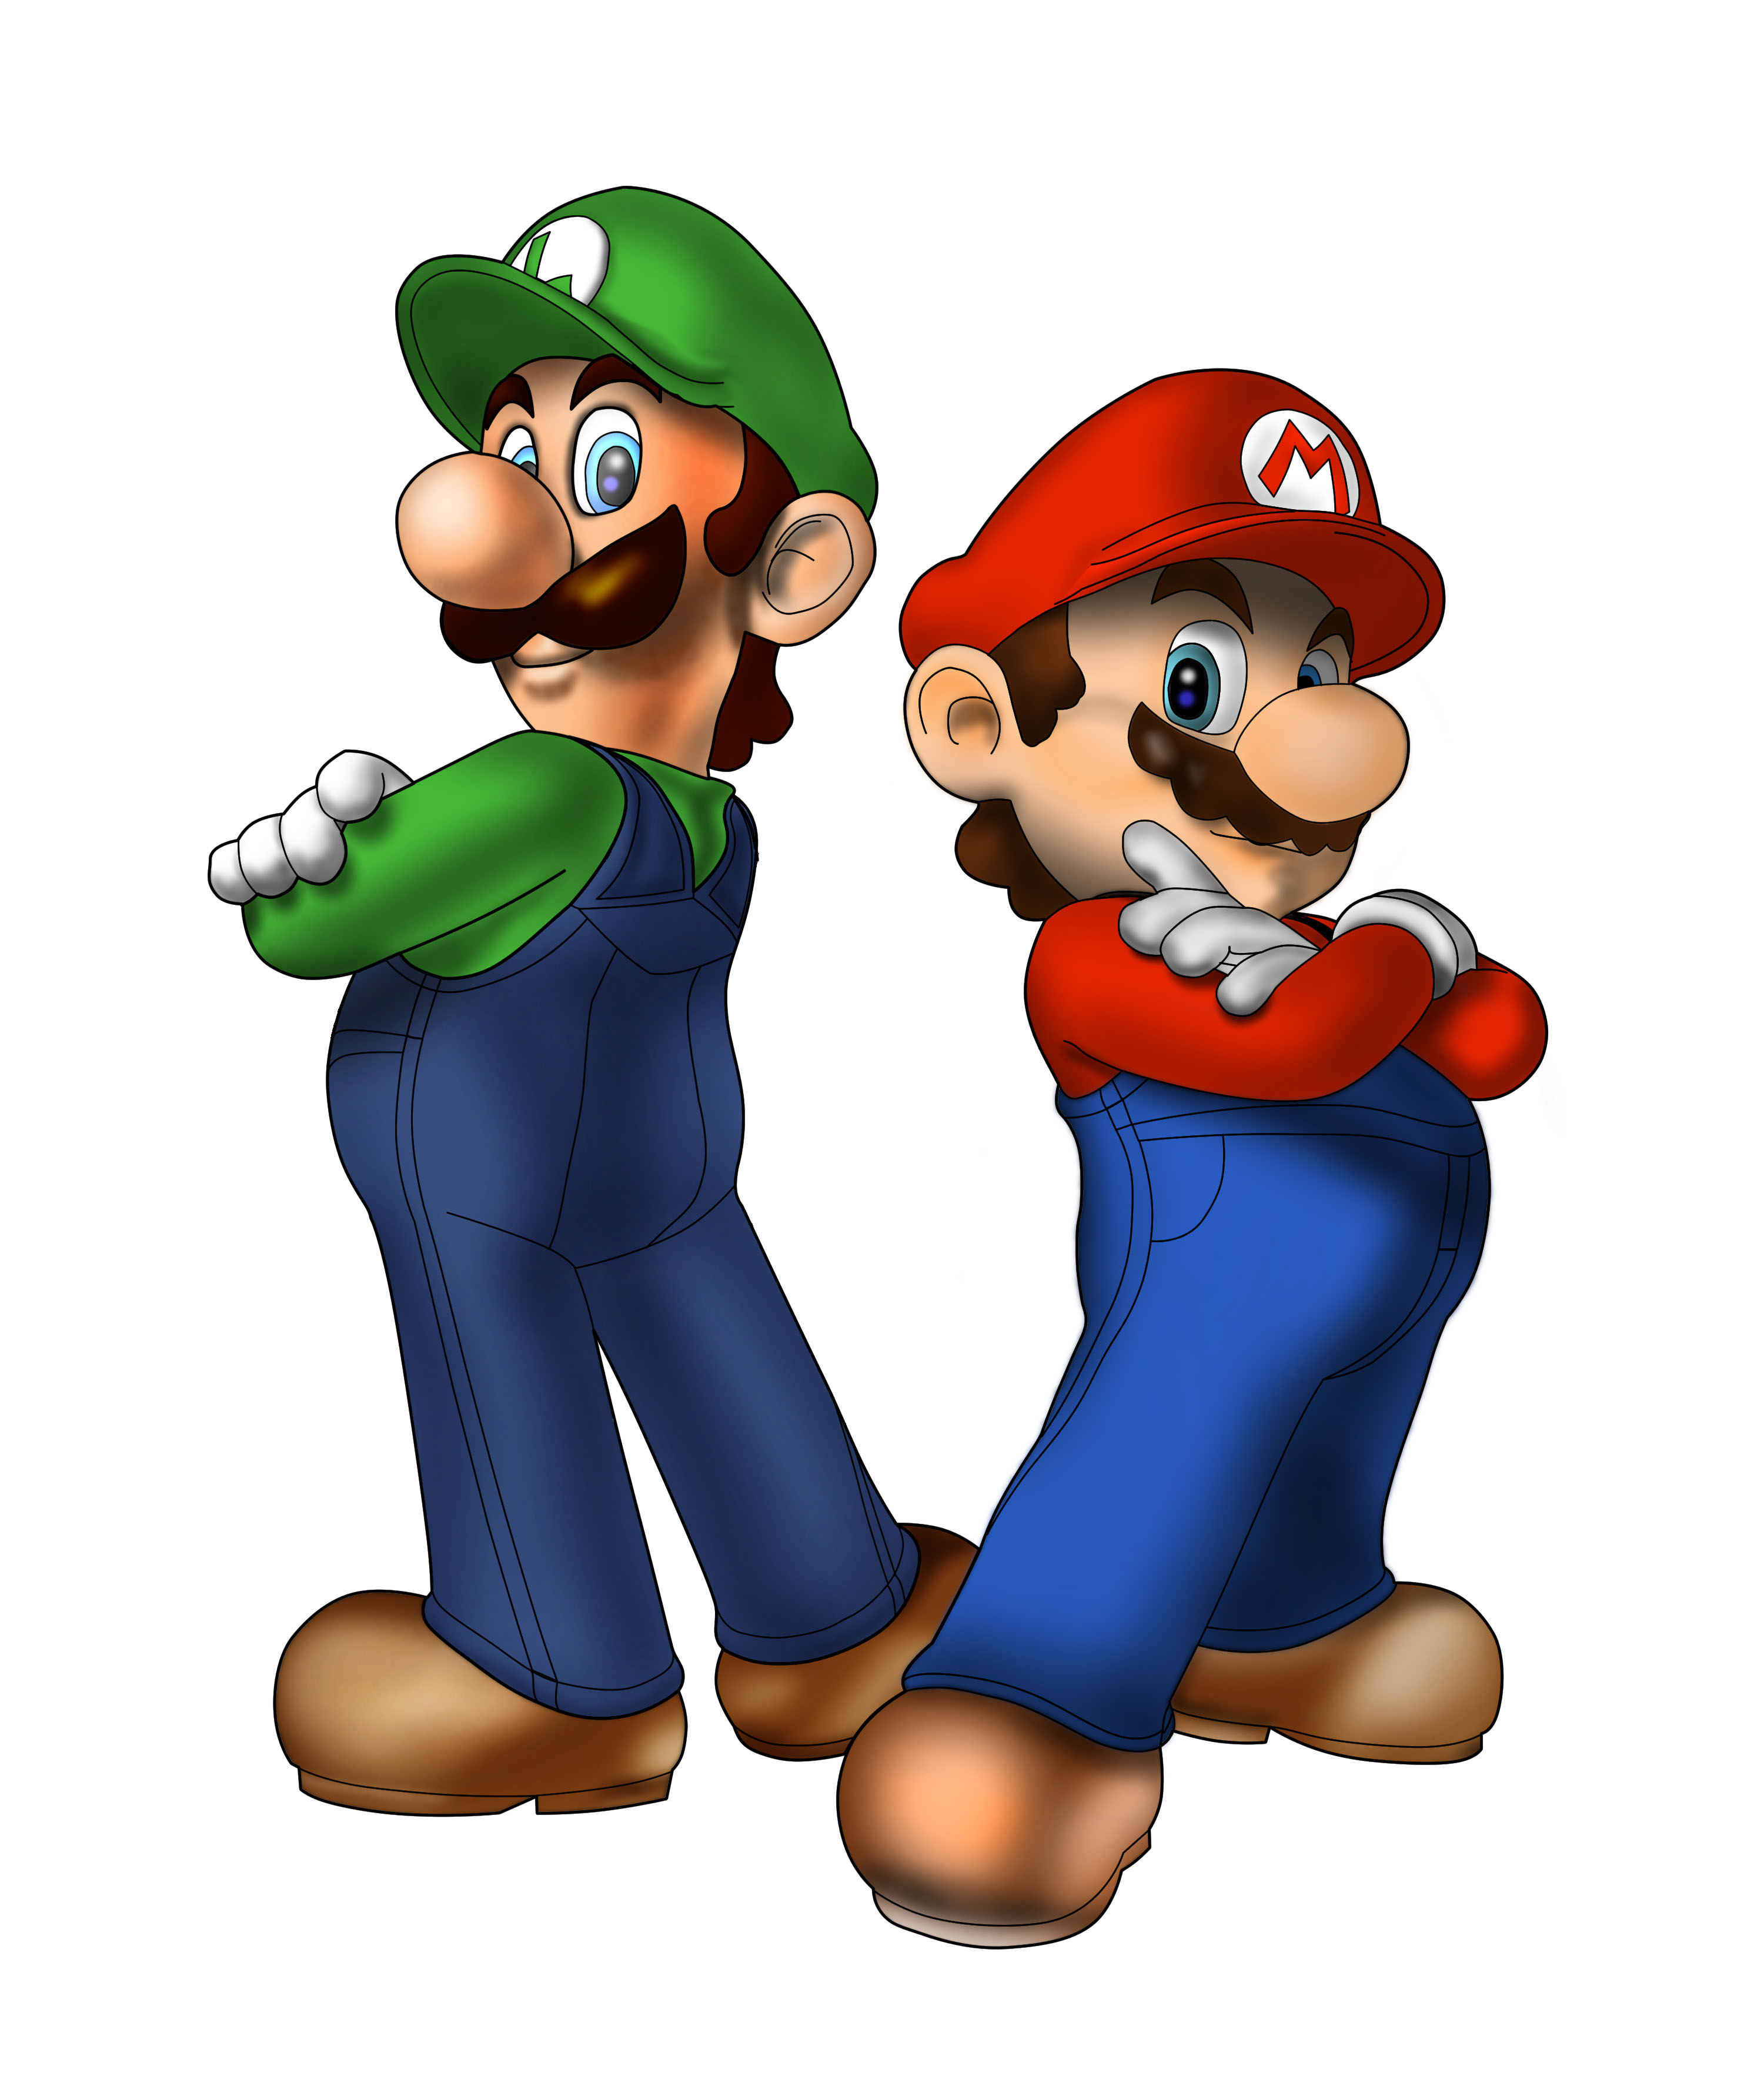 Mario And Luigi Clipart - Clipart Kid